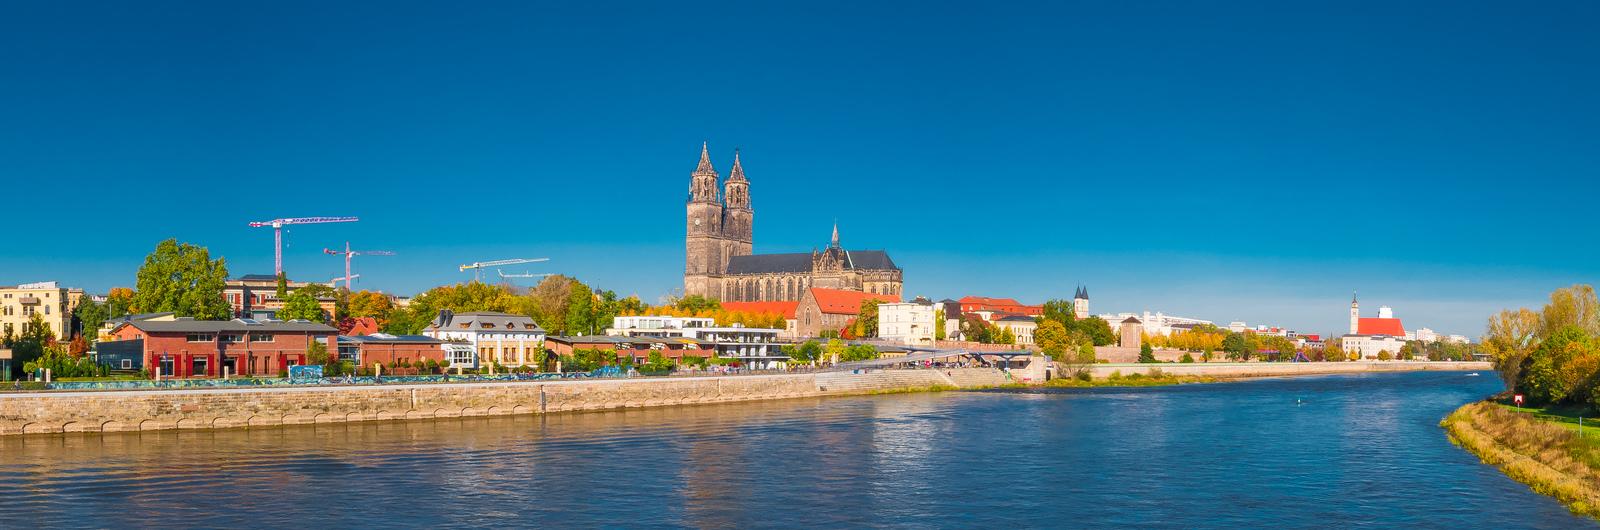 magdeburg city header